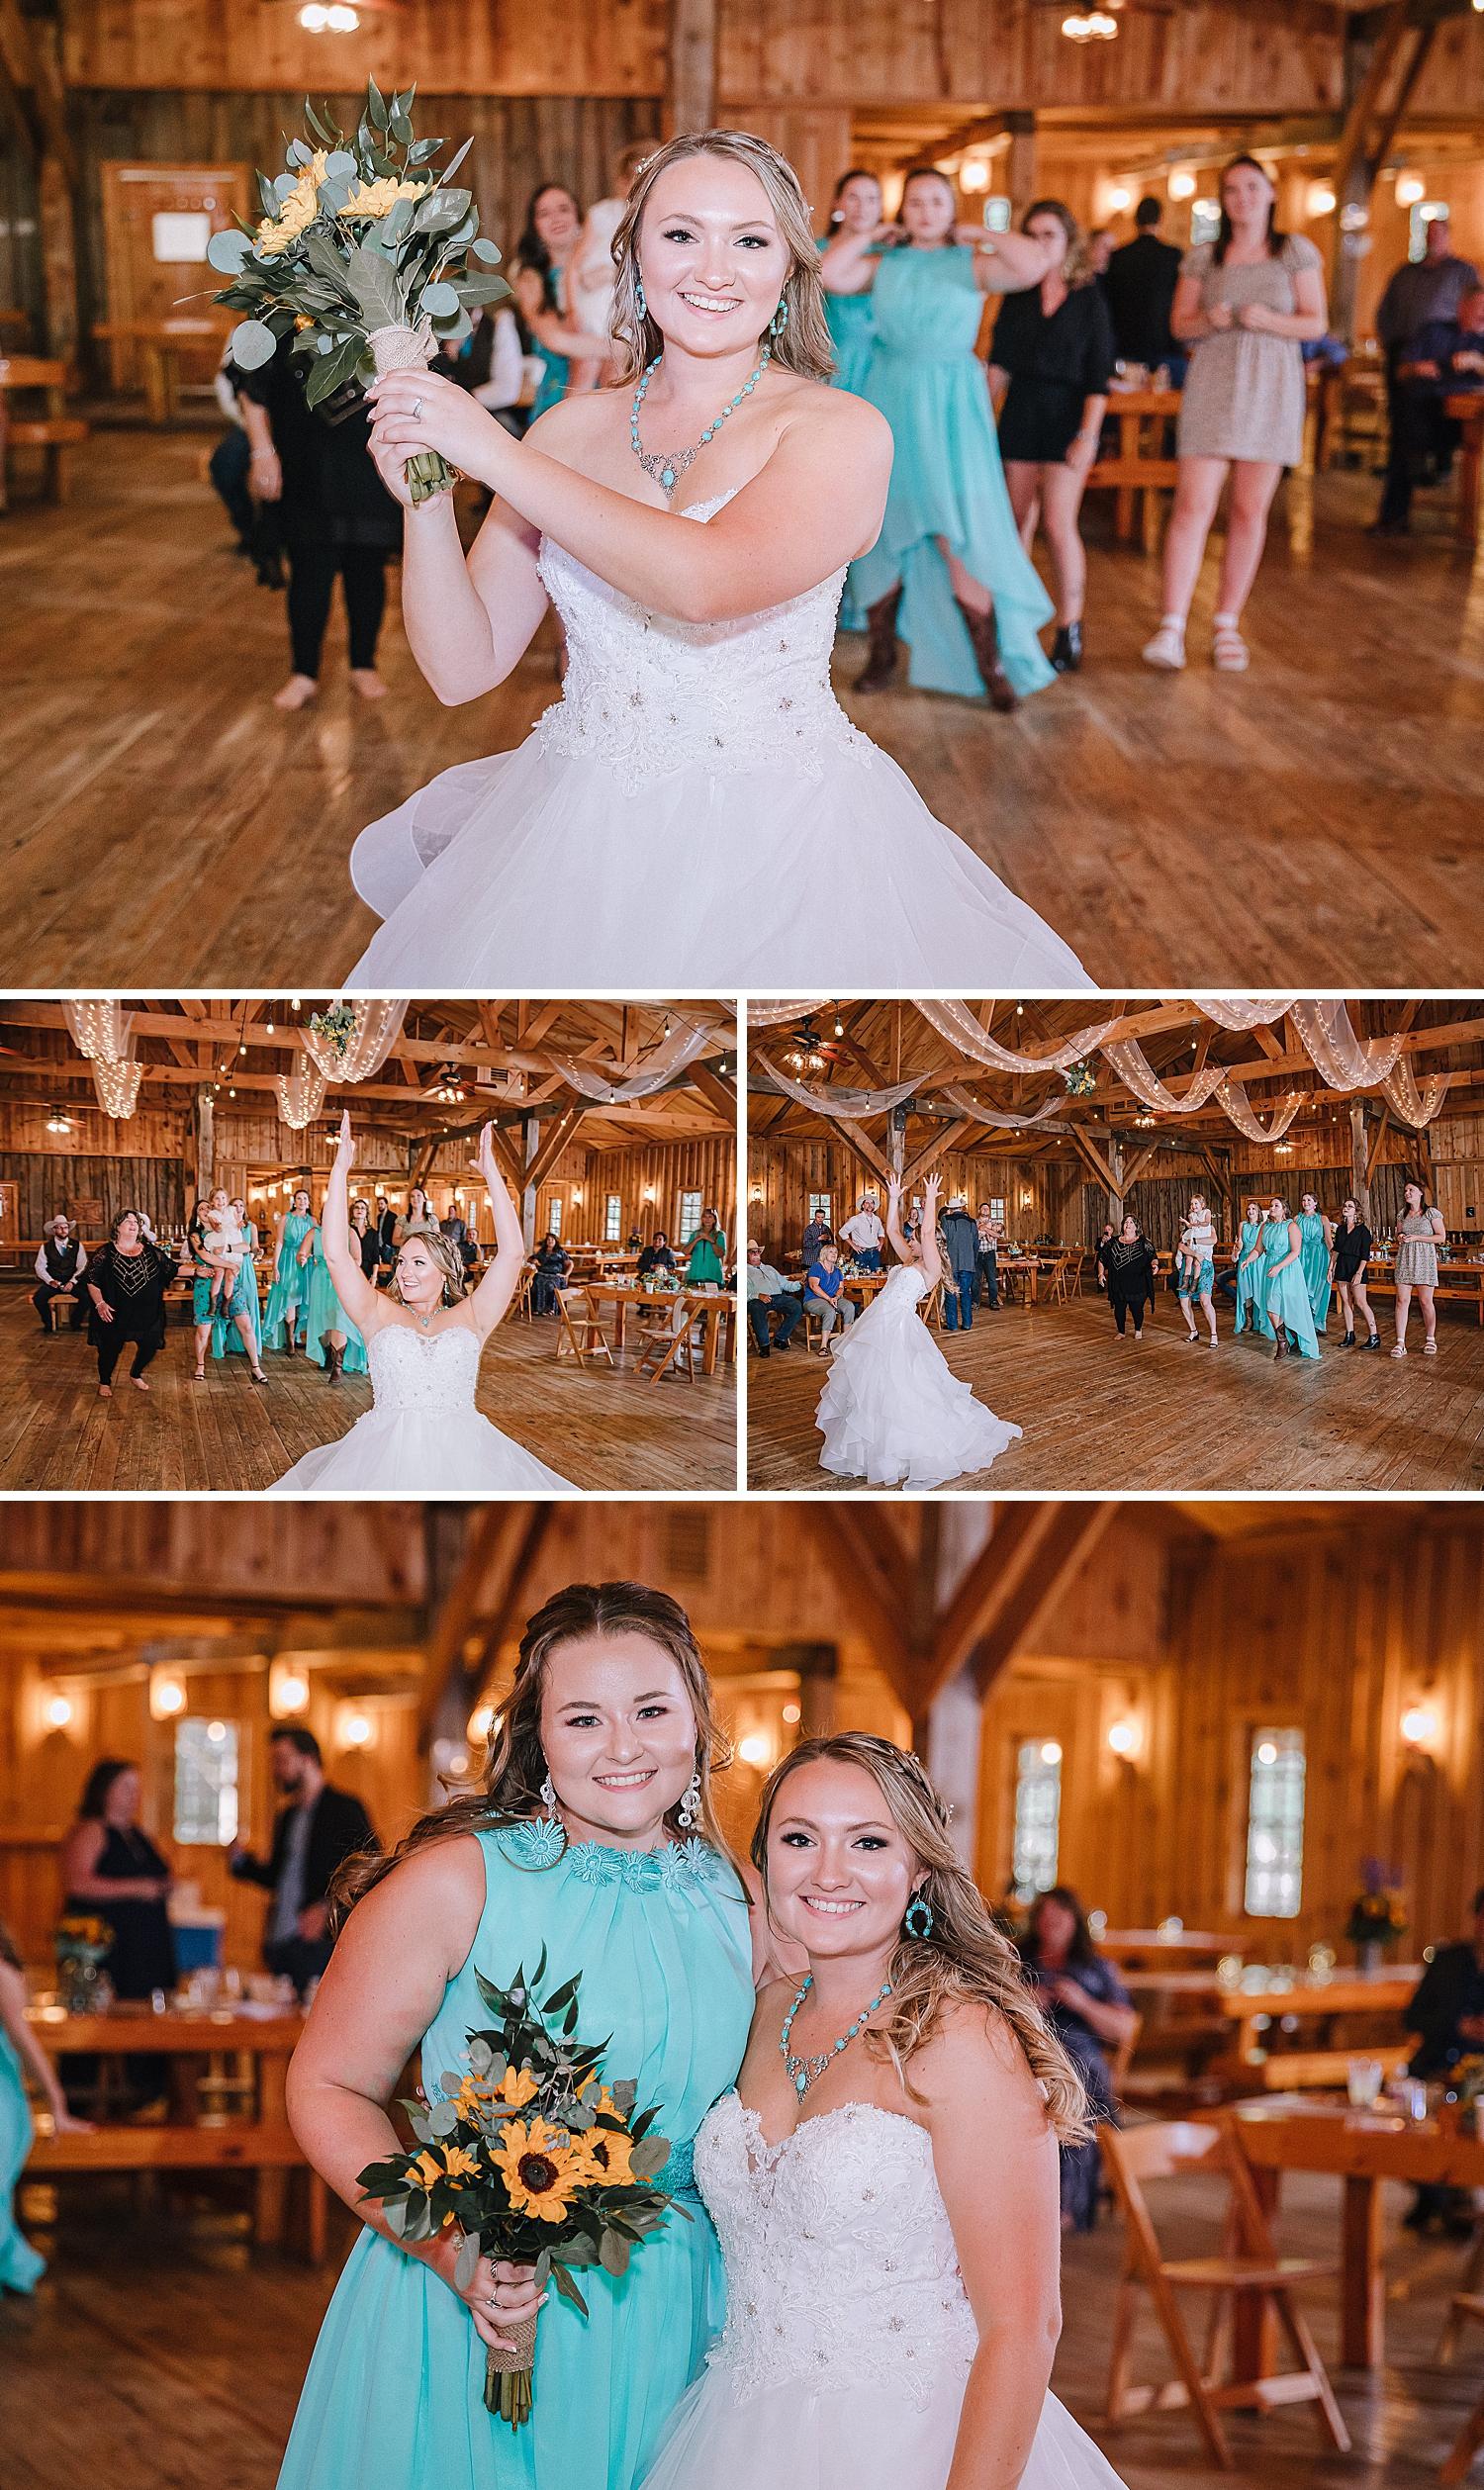 Carly-Barton-Photography-Old-Town-Texas-Rustic-Wedding-Photos-Sunflowers-Boots-Kyle-Texas_0080.jpg